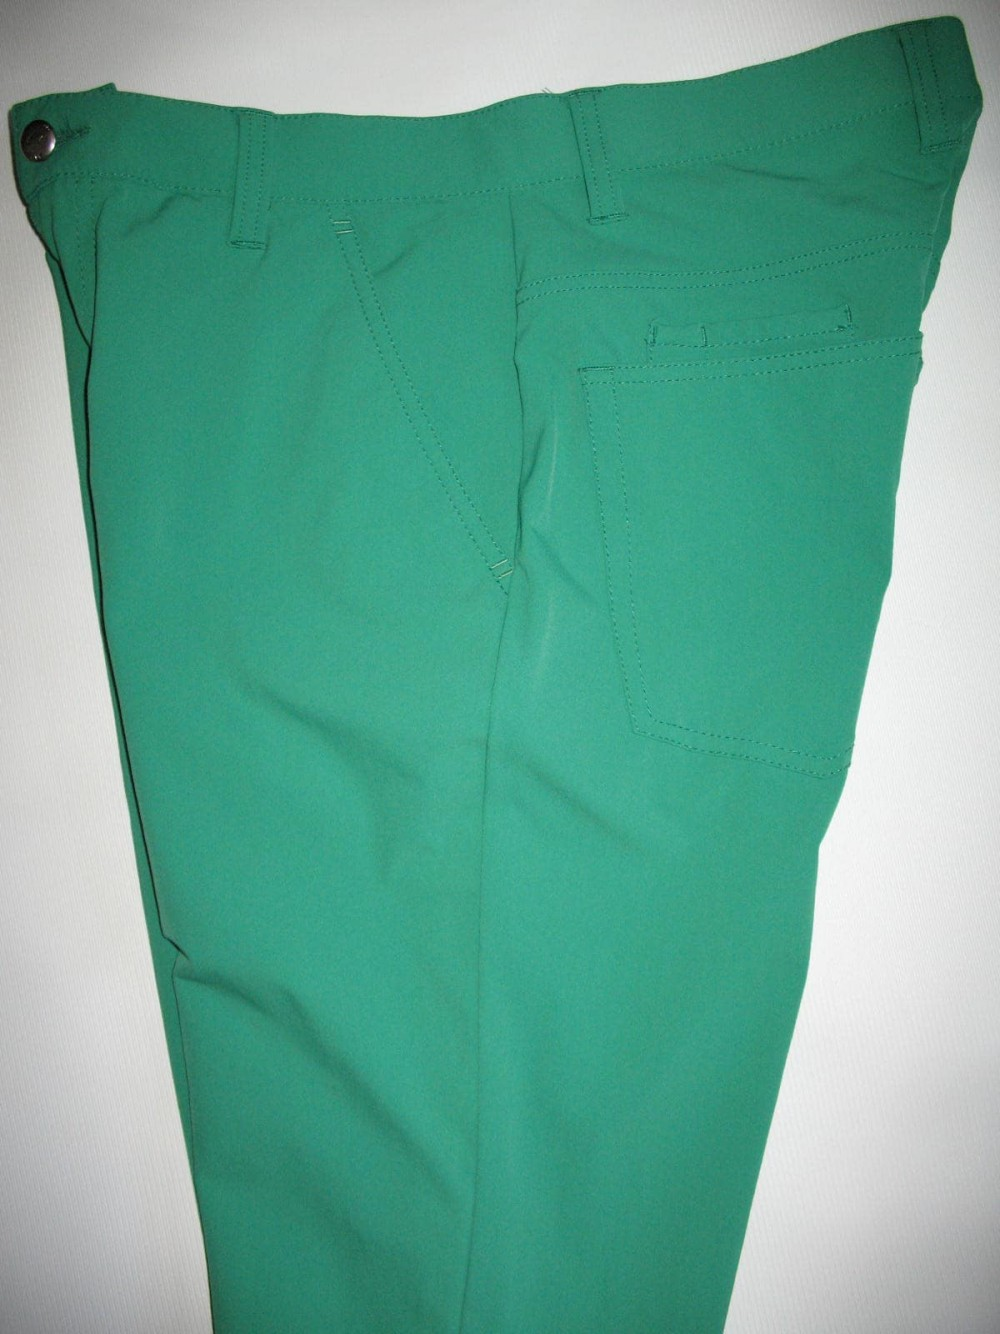 Штаны ALBERTO pro 3XDRY cooler pants (размер 48/M) - 5